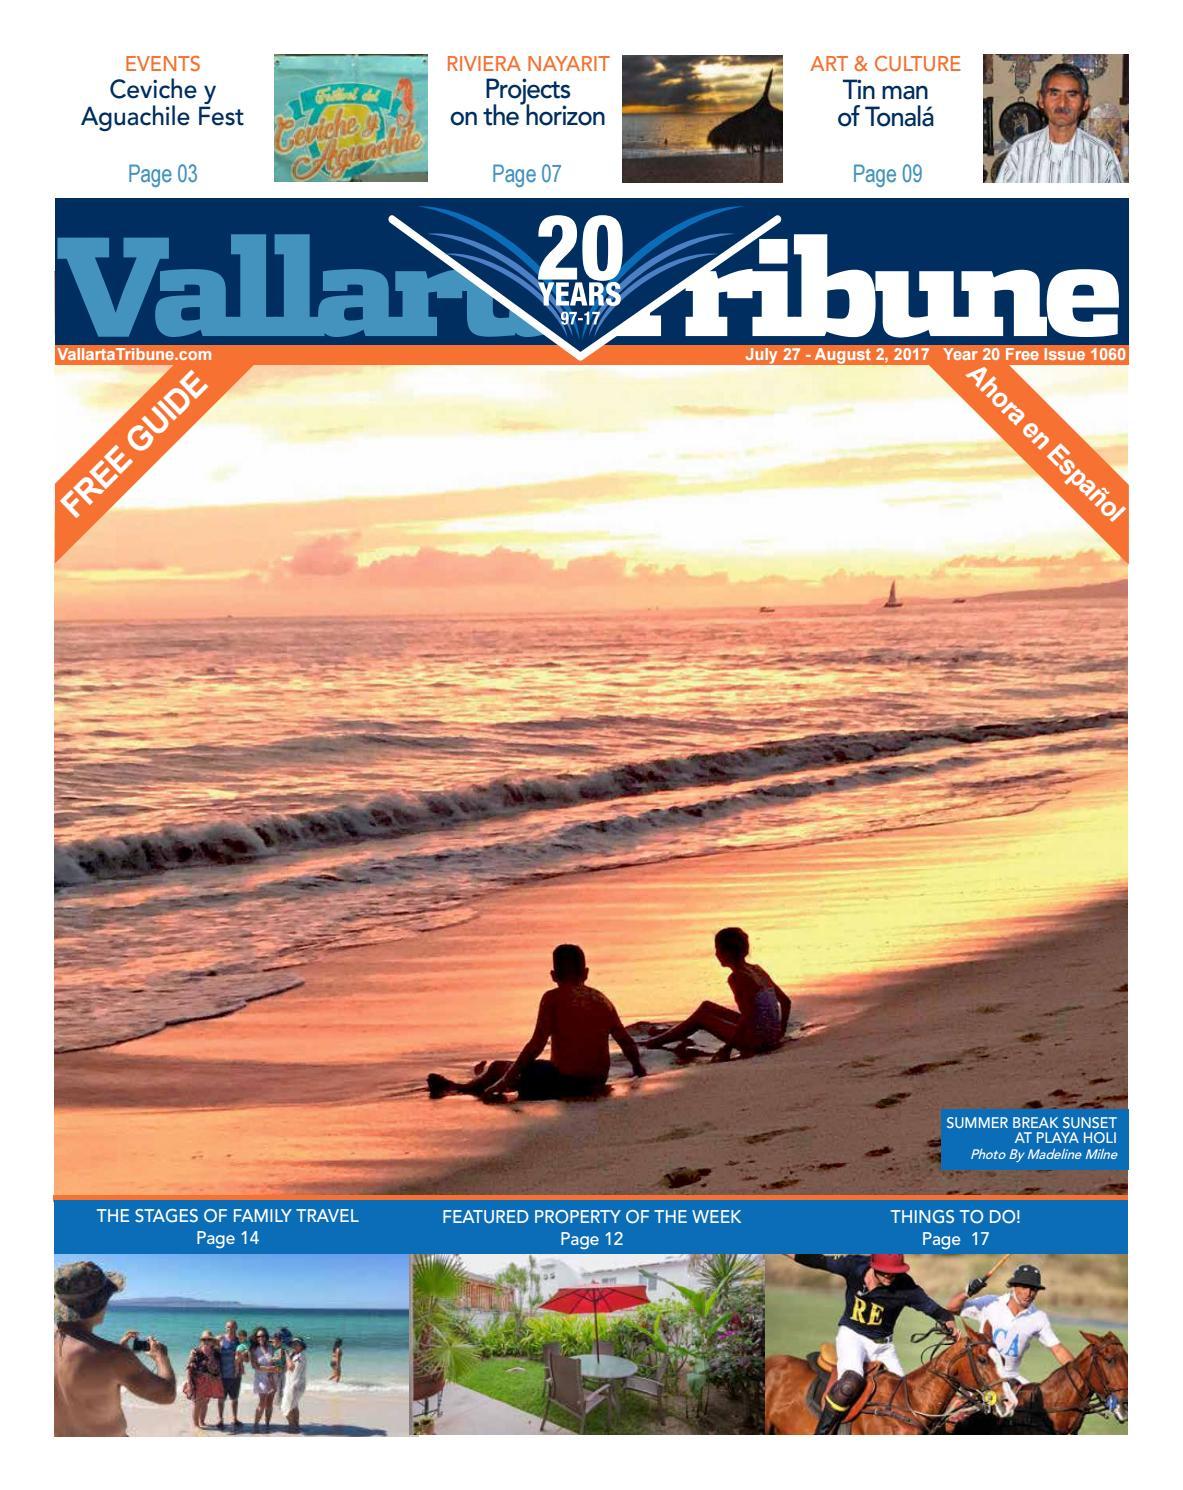 Issue 1060, July 27 - August 2, 2017 by Vallarta Tribune - issuu